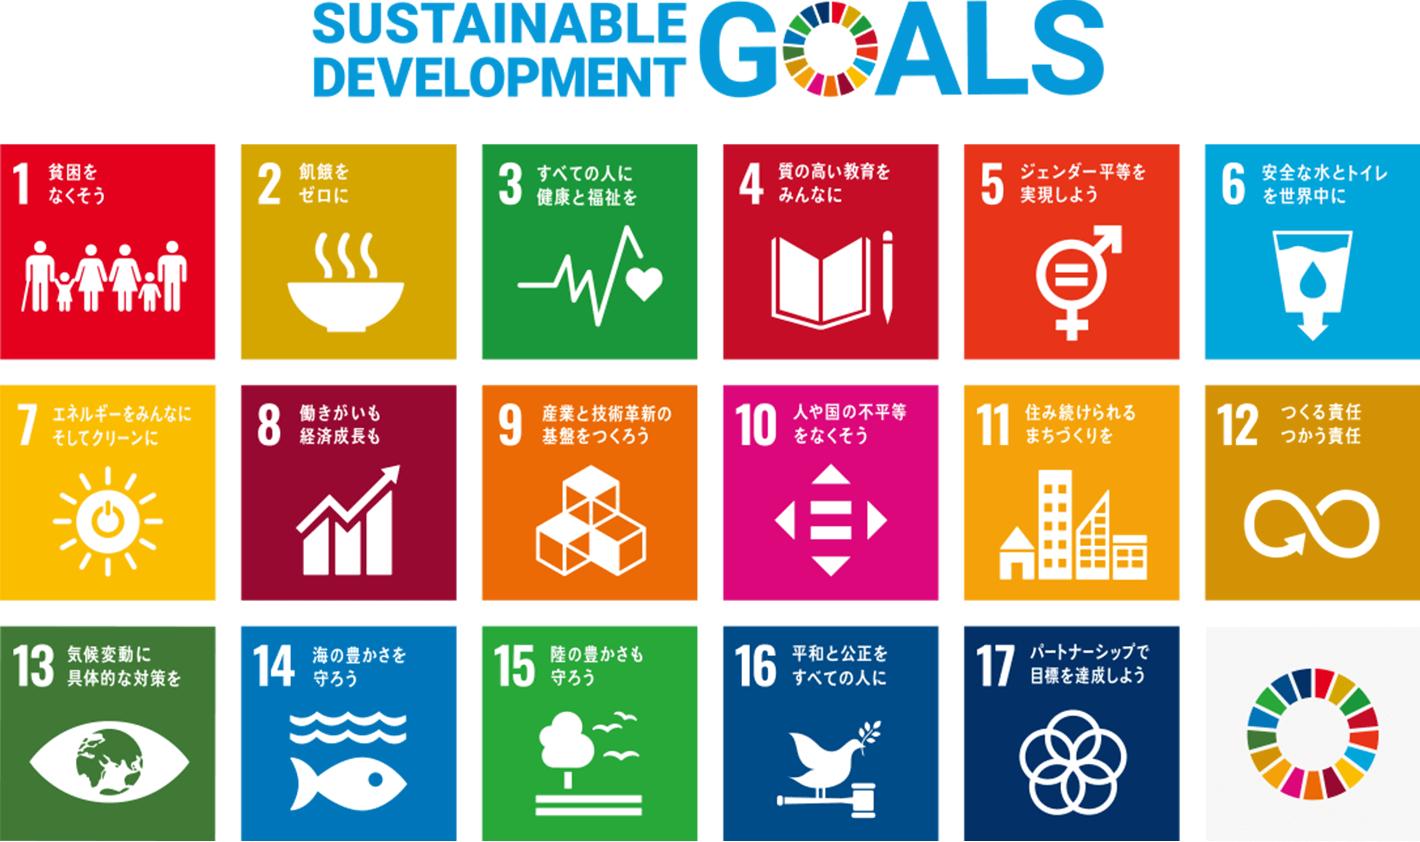 SDGsのポスター。グリーン司法書士法人のSDGsの取り組みをご紹介します。